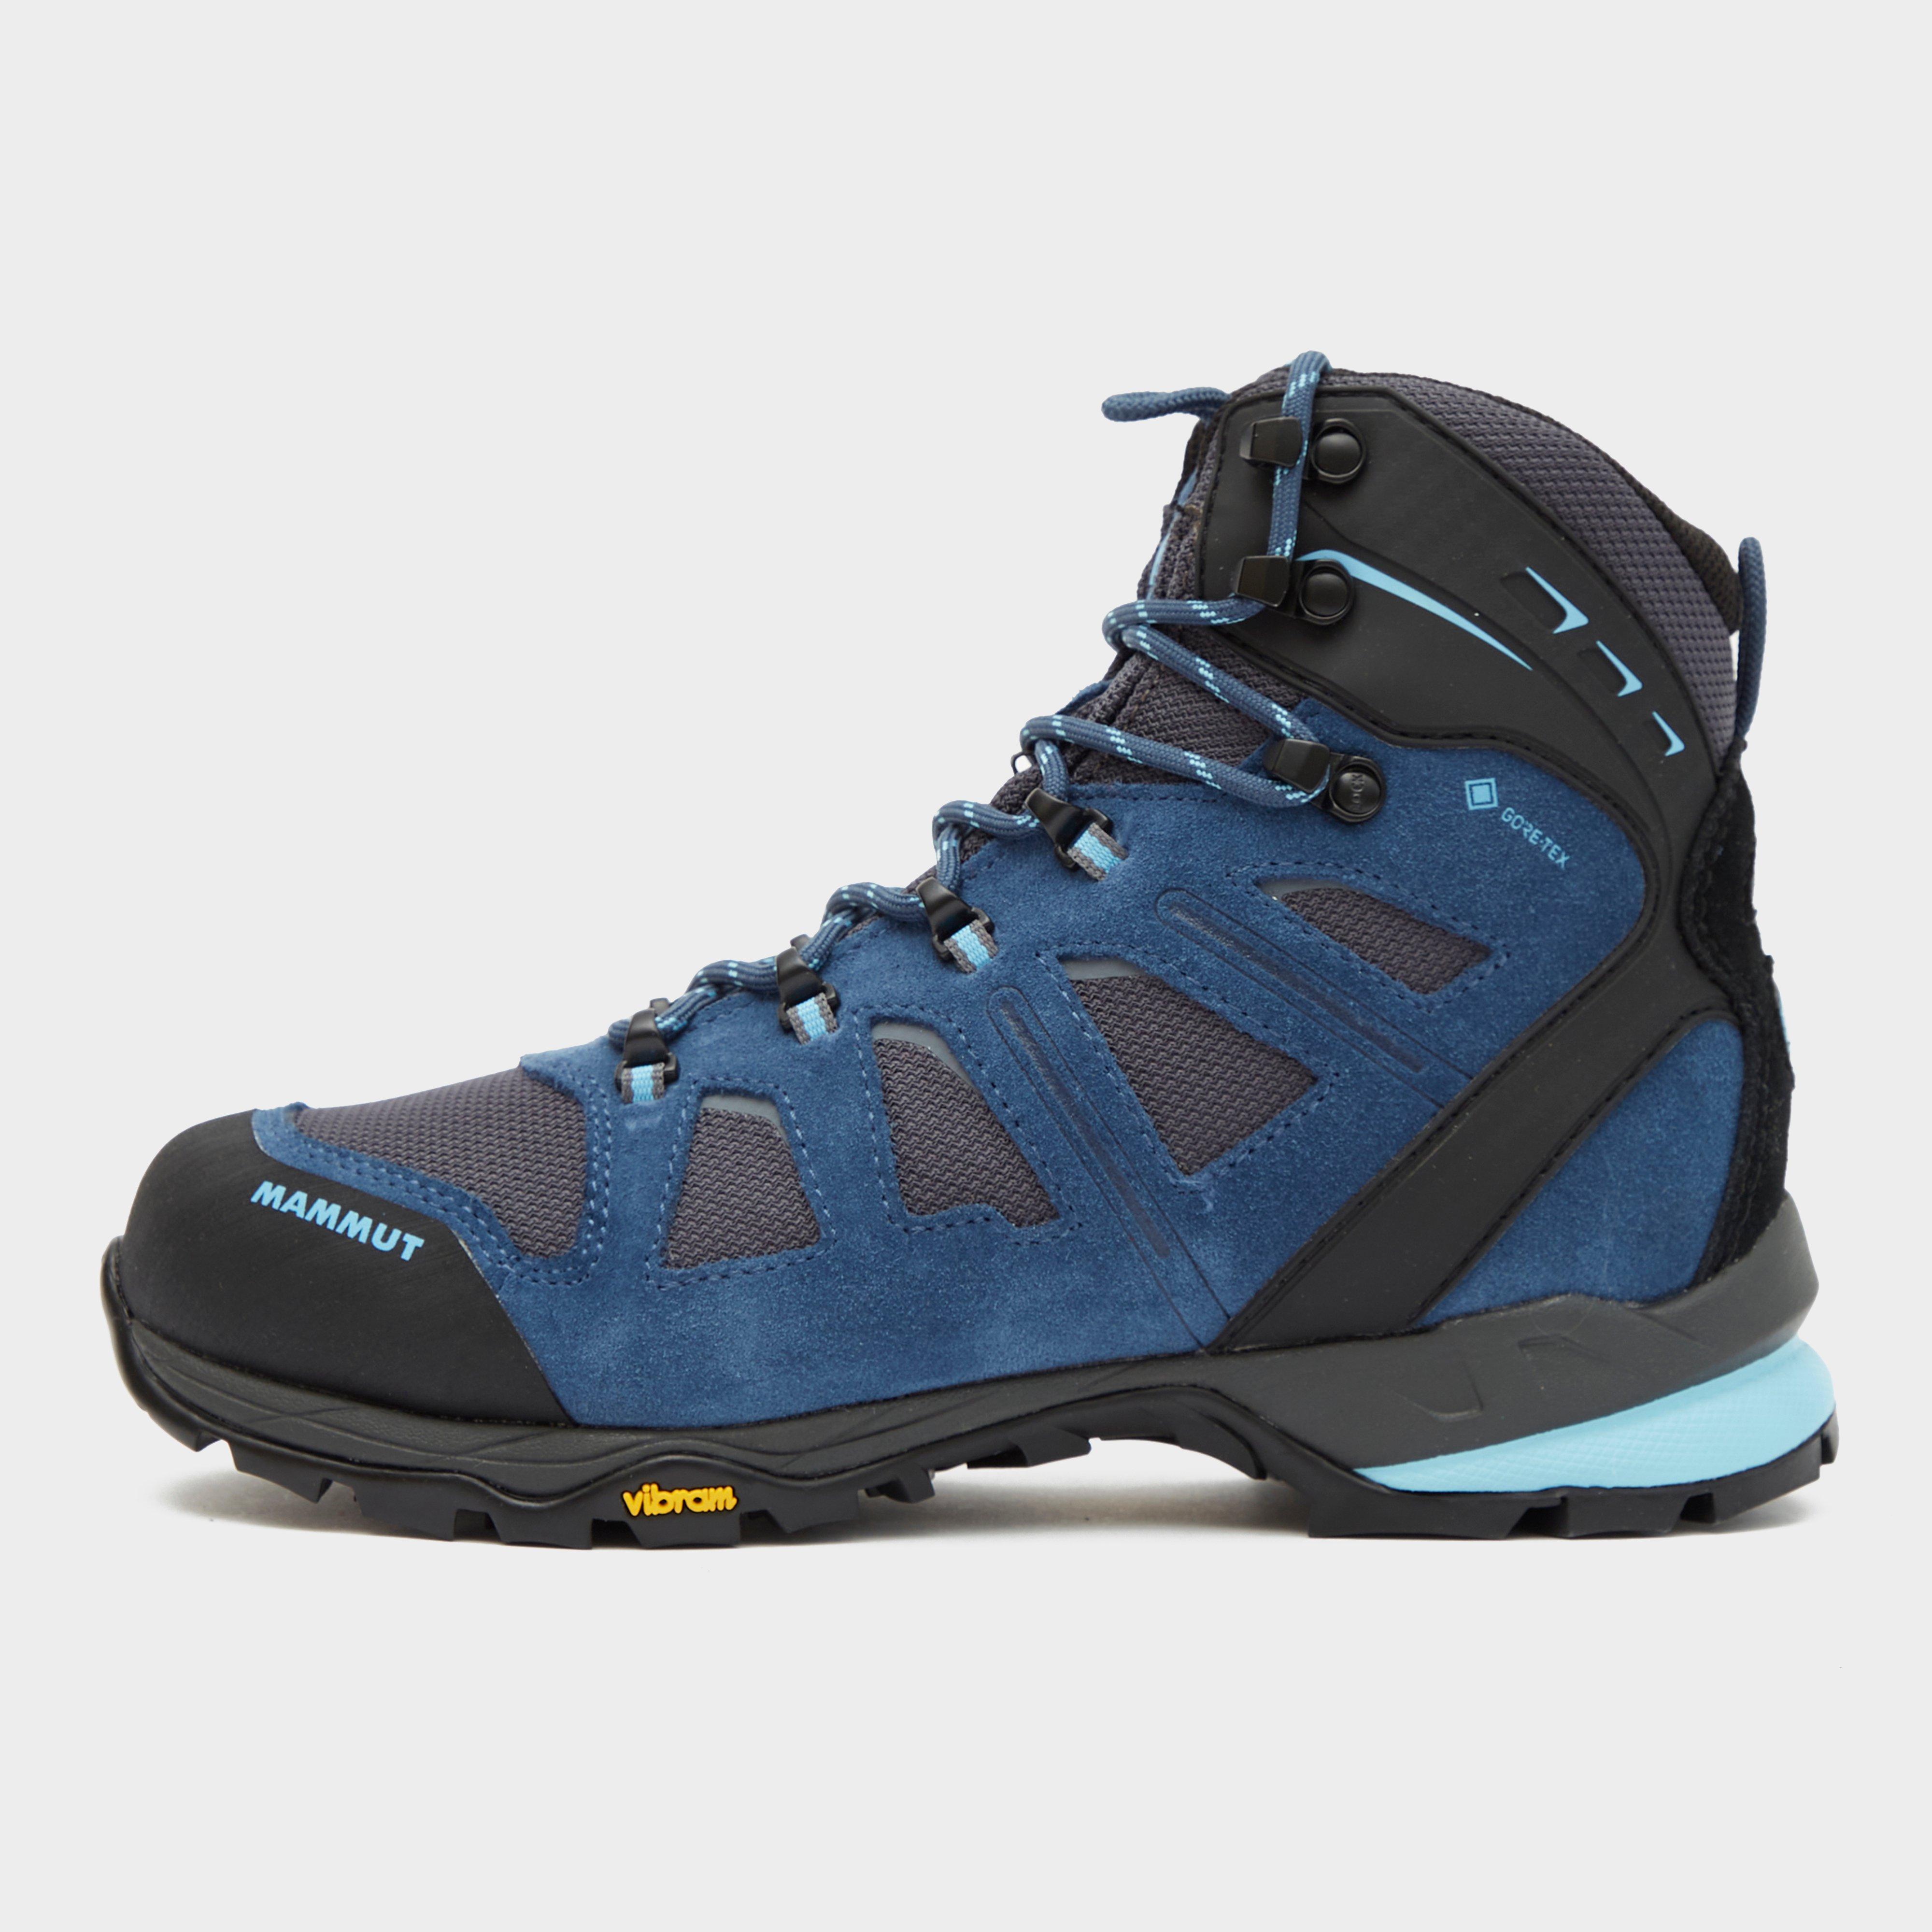 Mammut Women's T Aenergy High Gore-Tex, Walking Boots - Blue/Dbl, Blue/Dark Blue